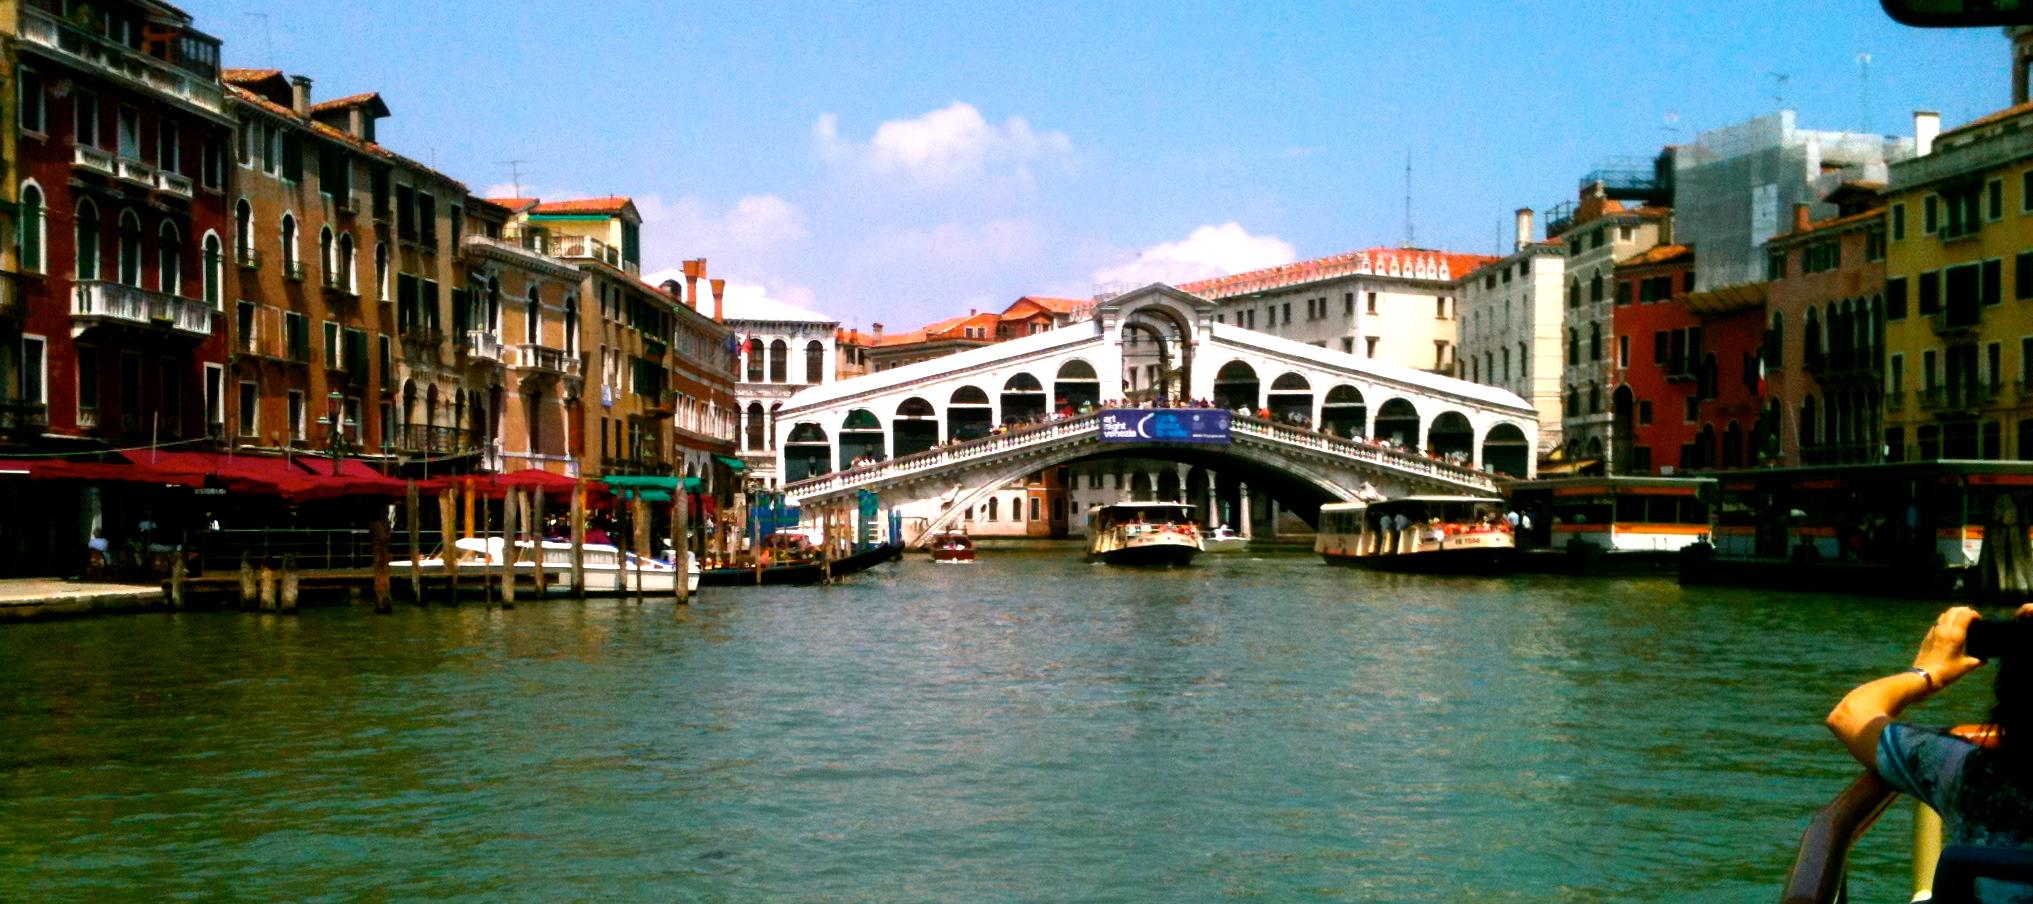 Venice academy of art